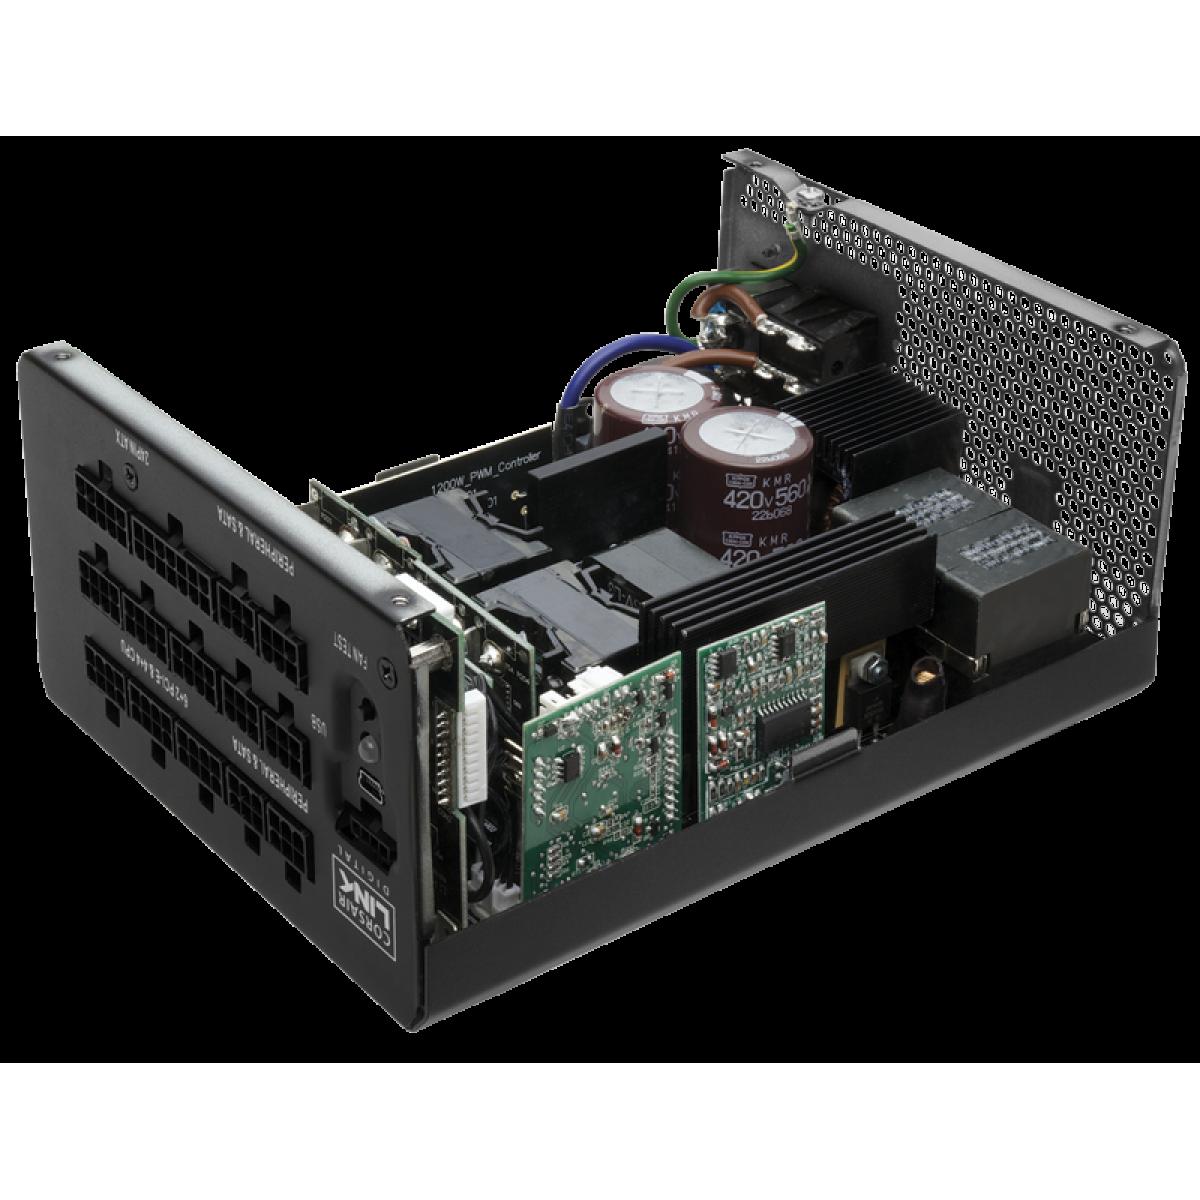 Fonte Corsair HX1200i 1200W, 80 Plus Platinum, PFC Ativo, Full Modular, CP-9020070-WW